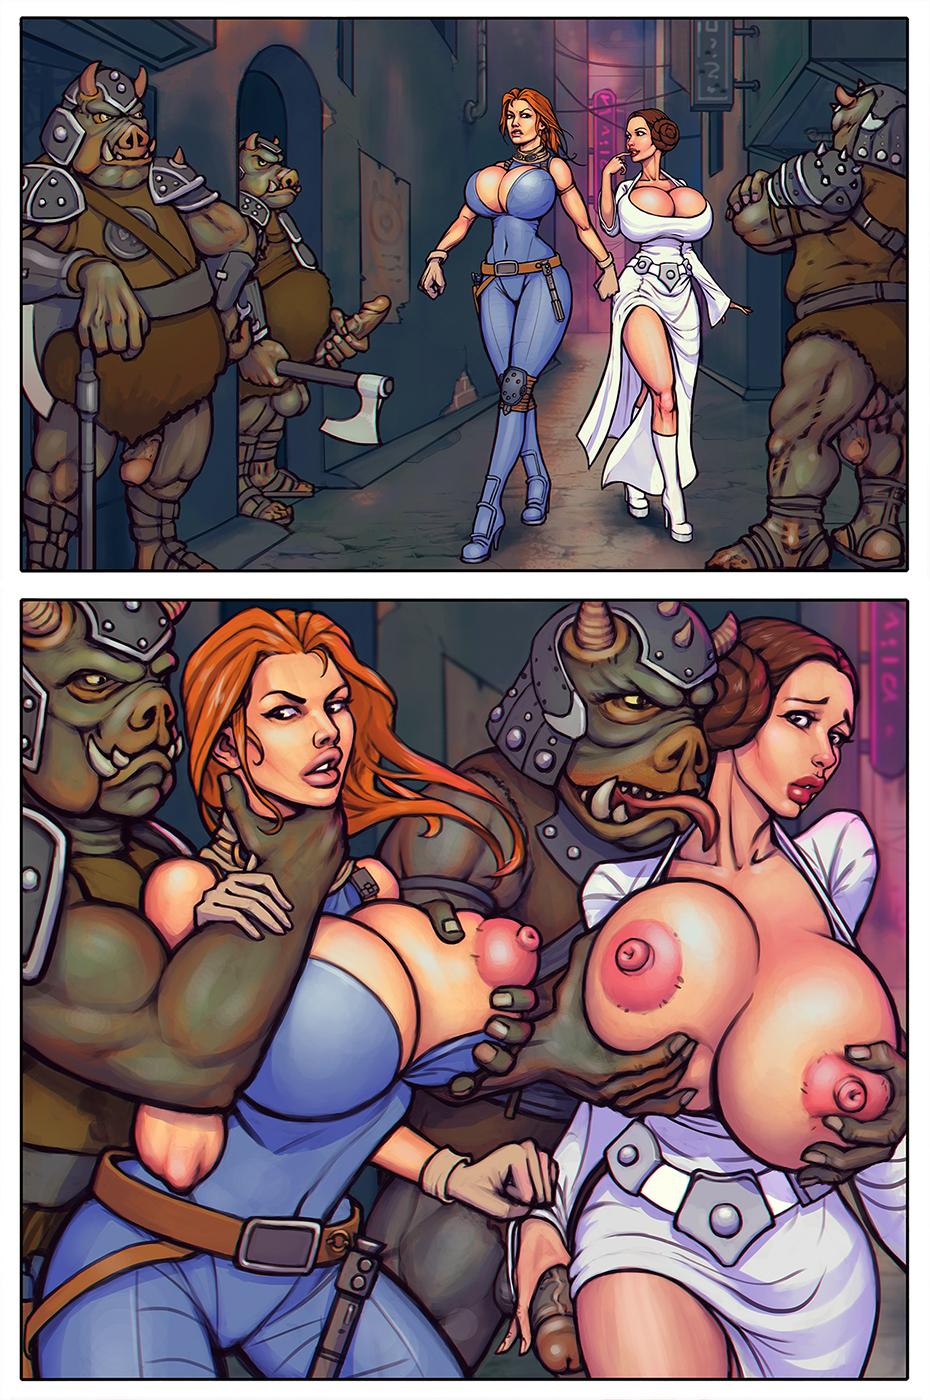 Princess Leia and Mara Jade